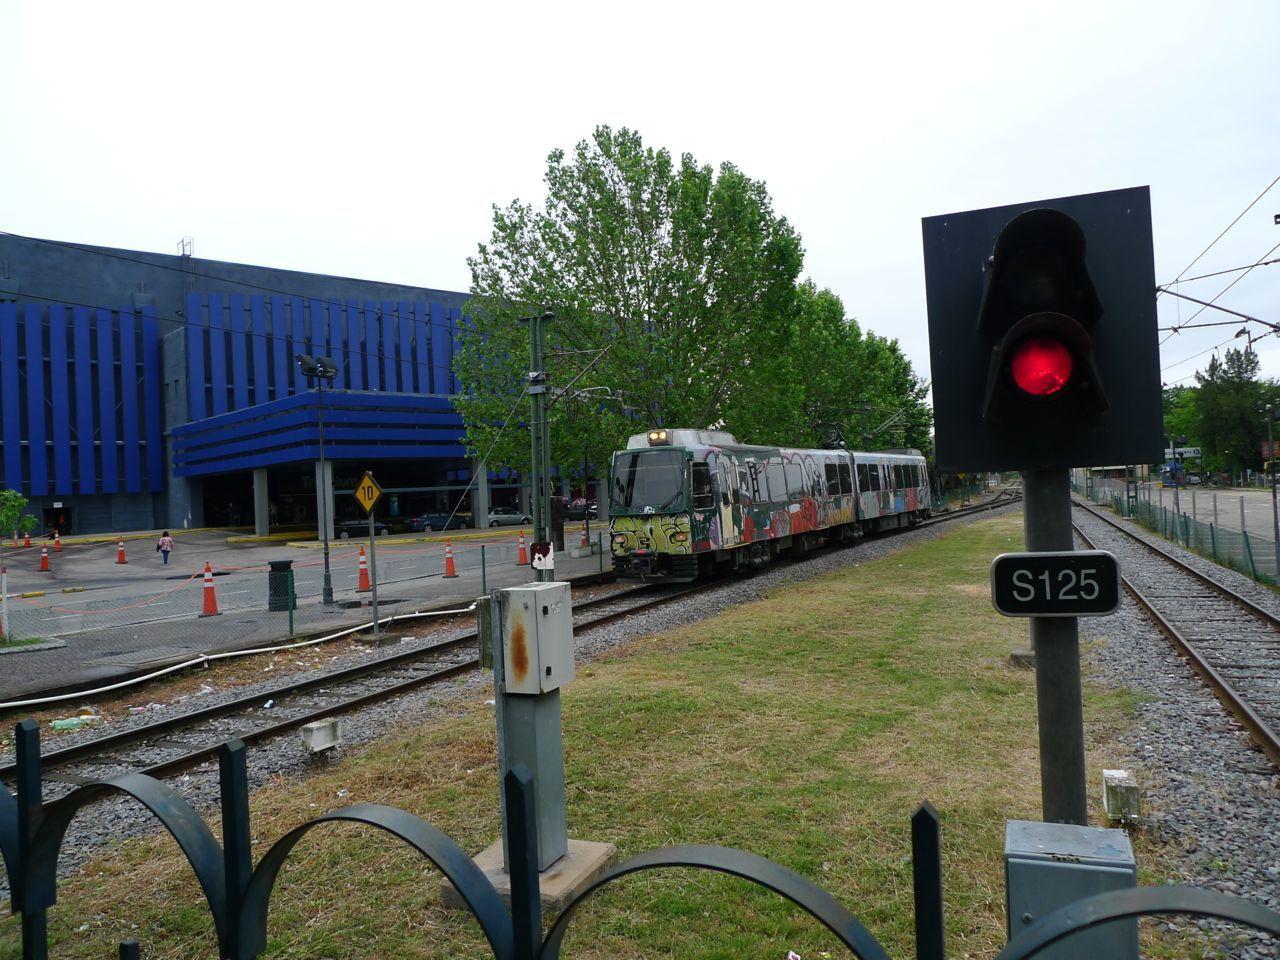 Gare de Tigre, tren de la Costa, les antiquaires, gare de buenos Aires Retiro Mitre